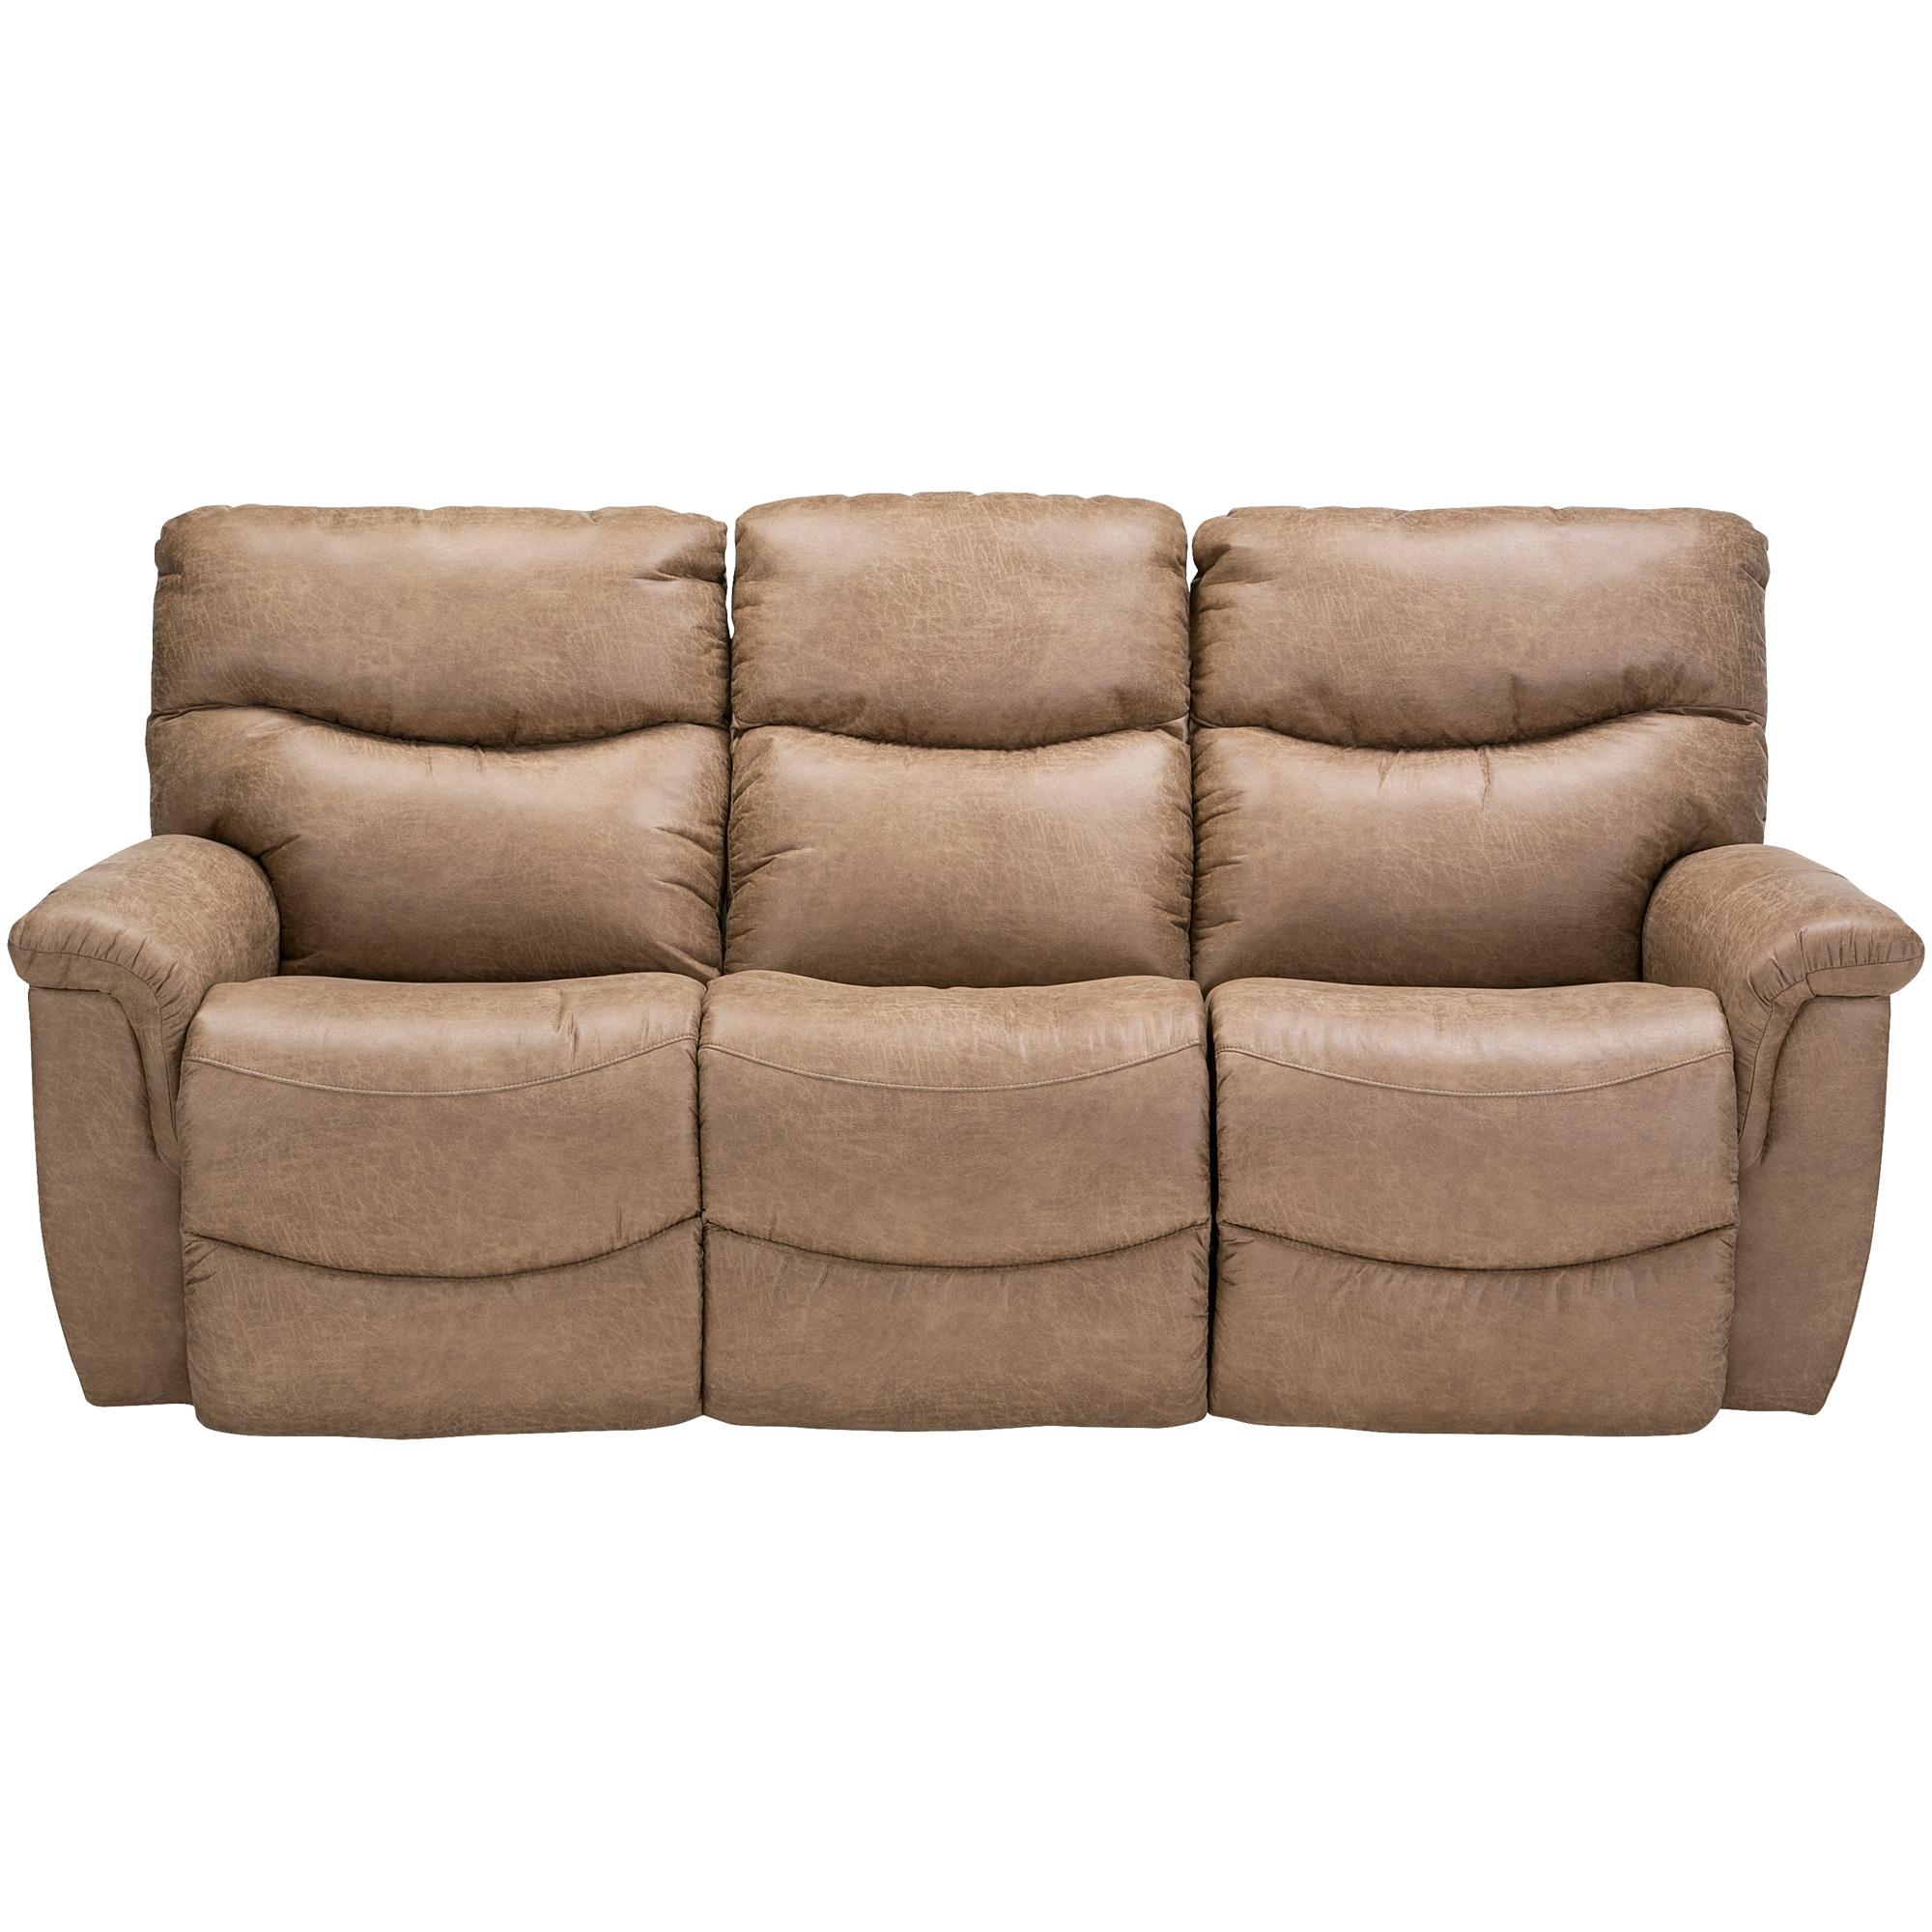 slumberland com sofas single chair sofa bed with storage james power lazy boy taraba home review